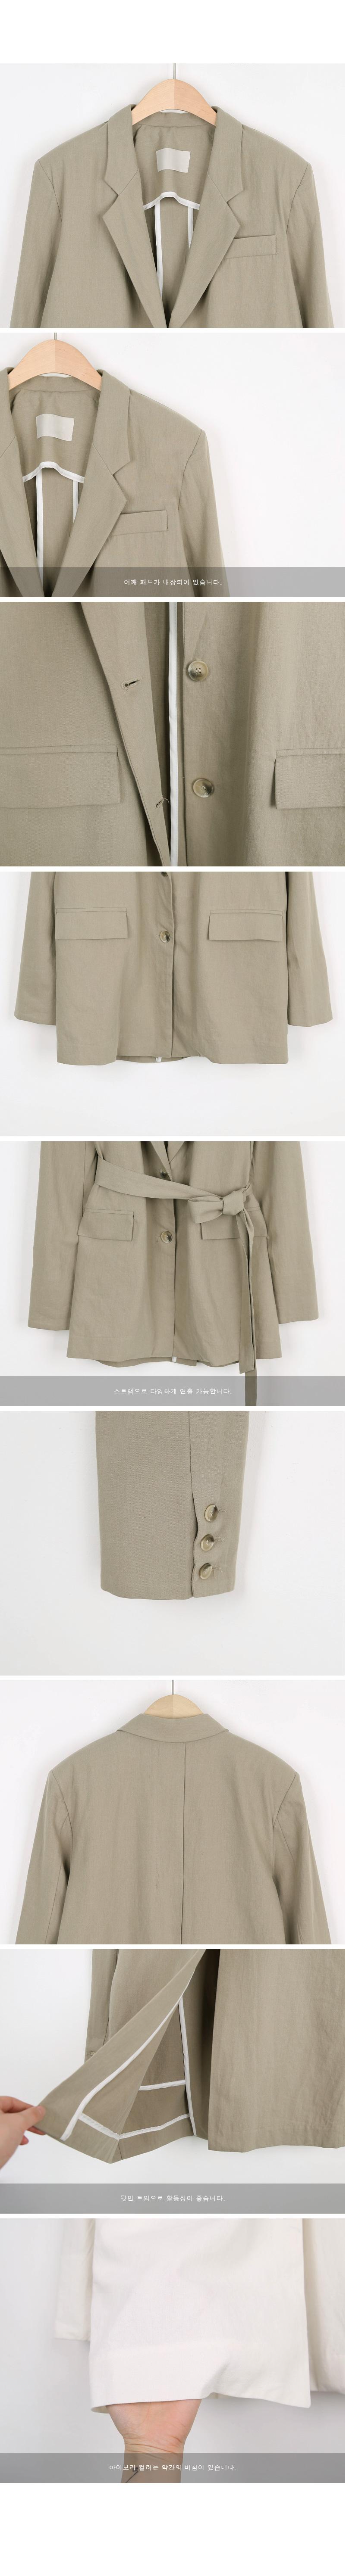 Linen strap jacket